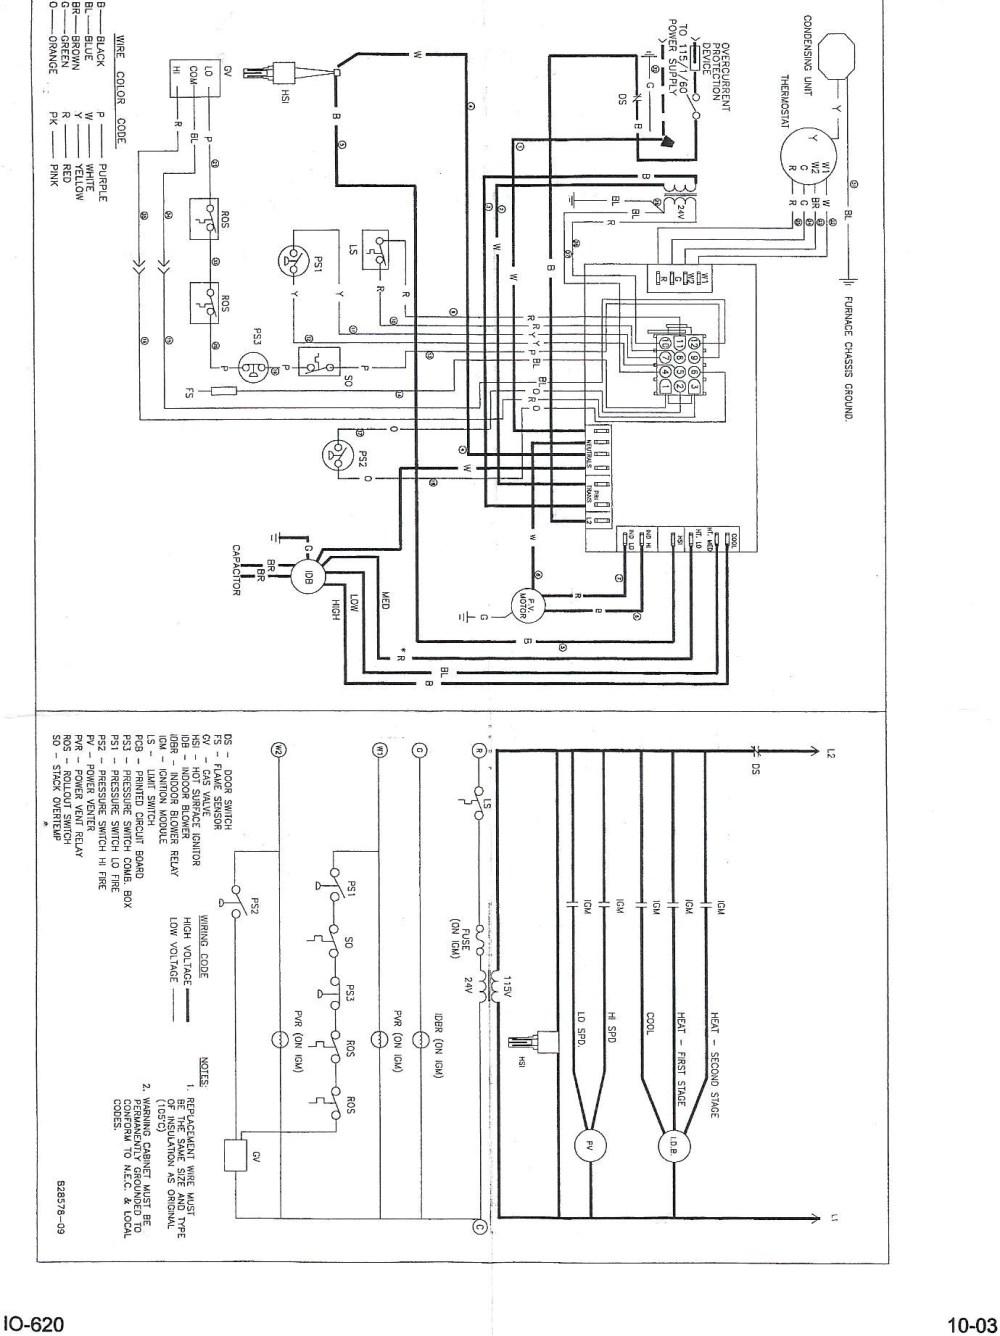 medium resolution of newair wiring diagram index listing of wiring diagrams electric garage heaters home depot newair g73 wiring diagram